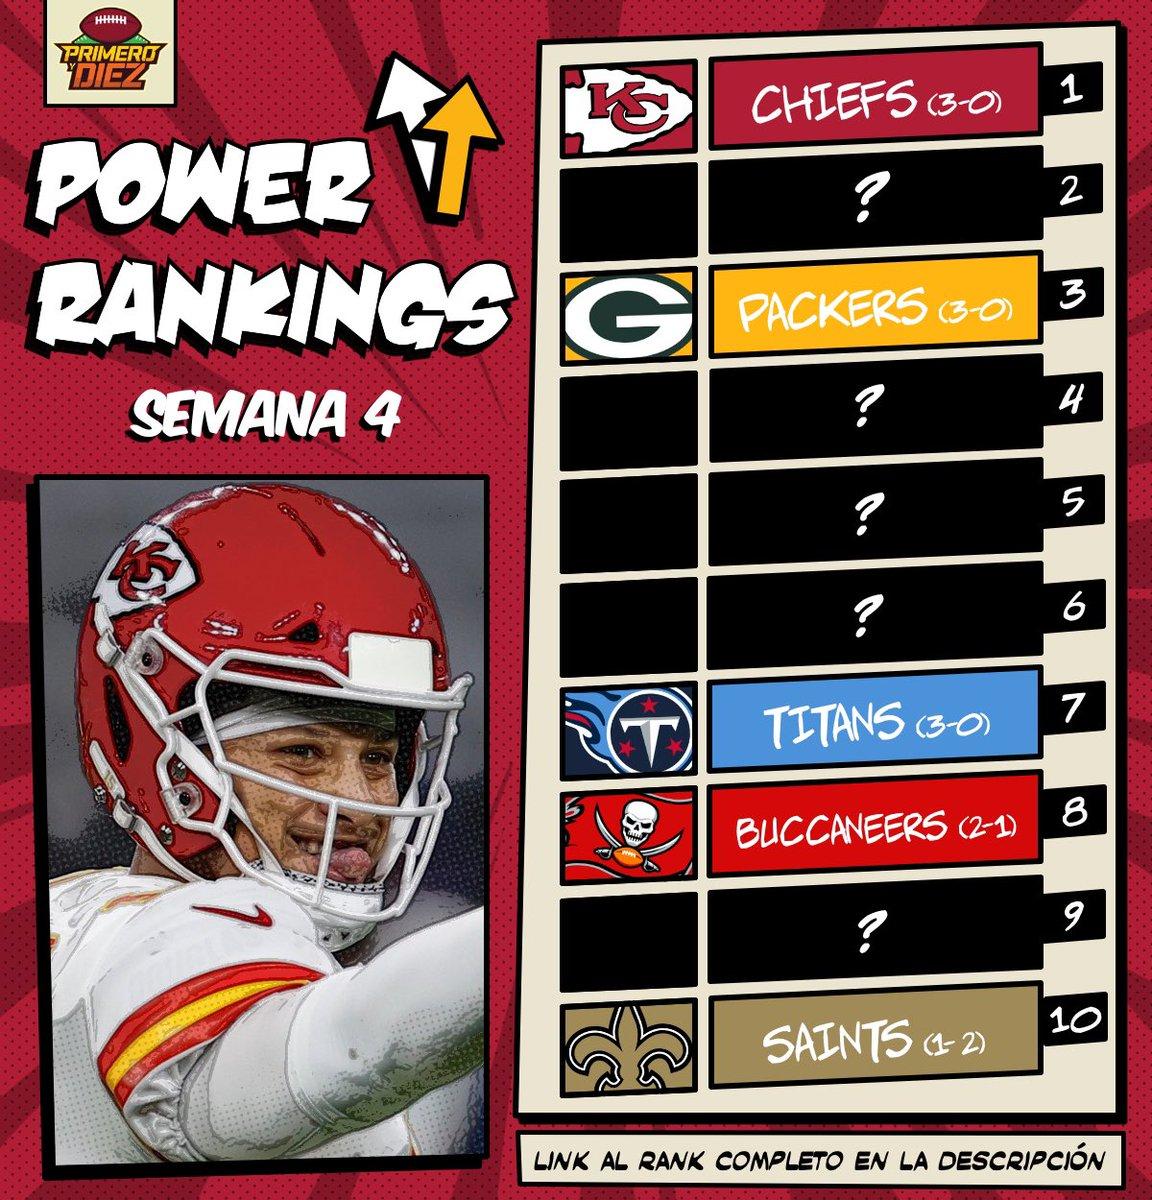 Llegaron los Power Rankings 📊 para la semana 4 de la #NFL   ▶️ https://t.co/Si6MXnI5Gf https://t.co/JkQkyMubRF